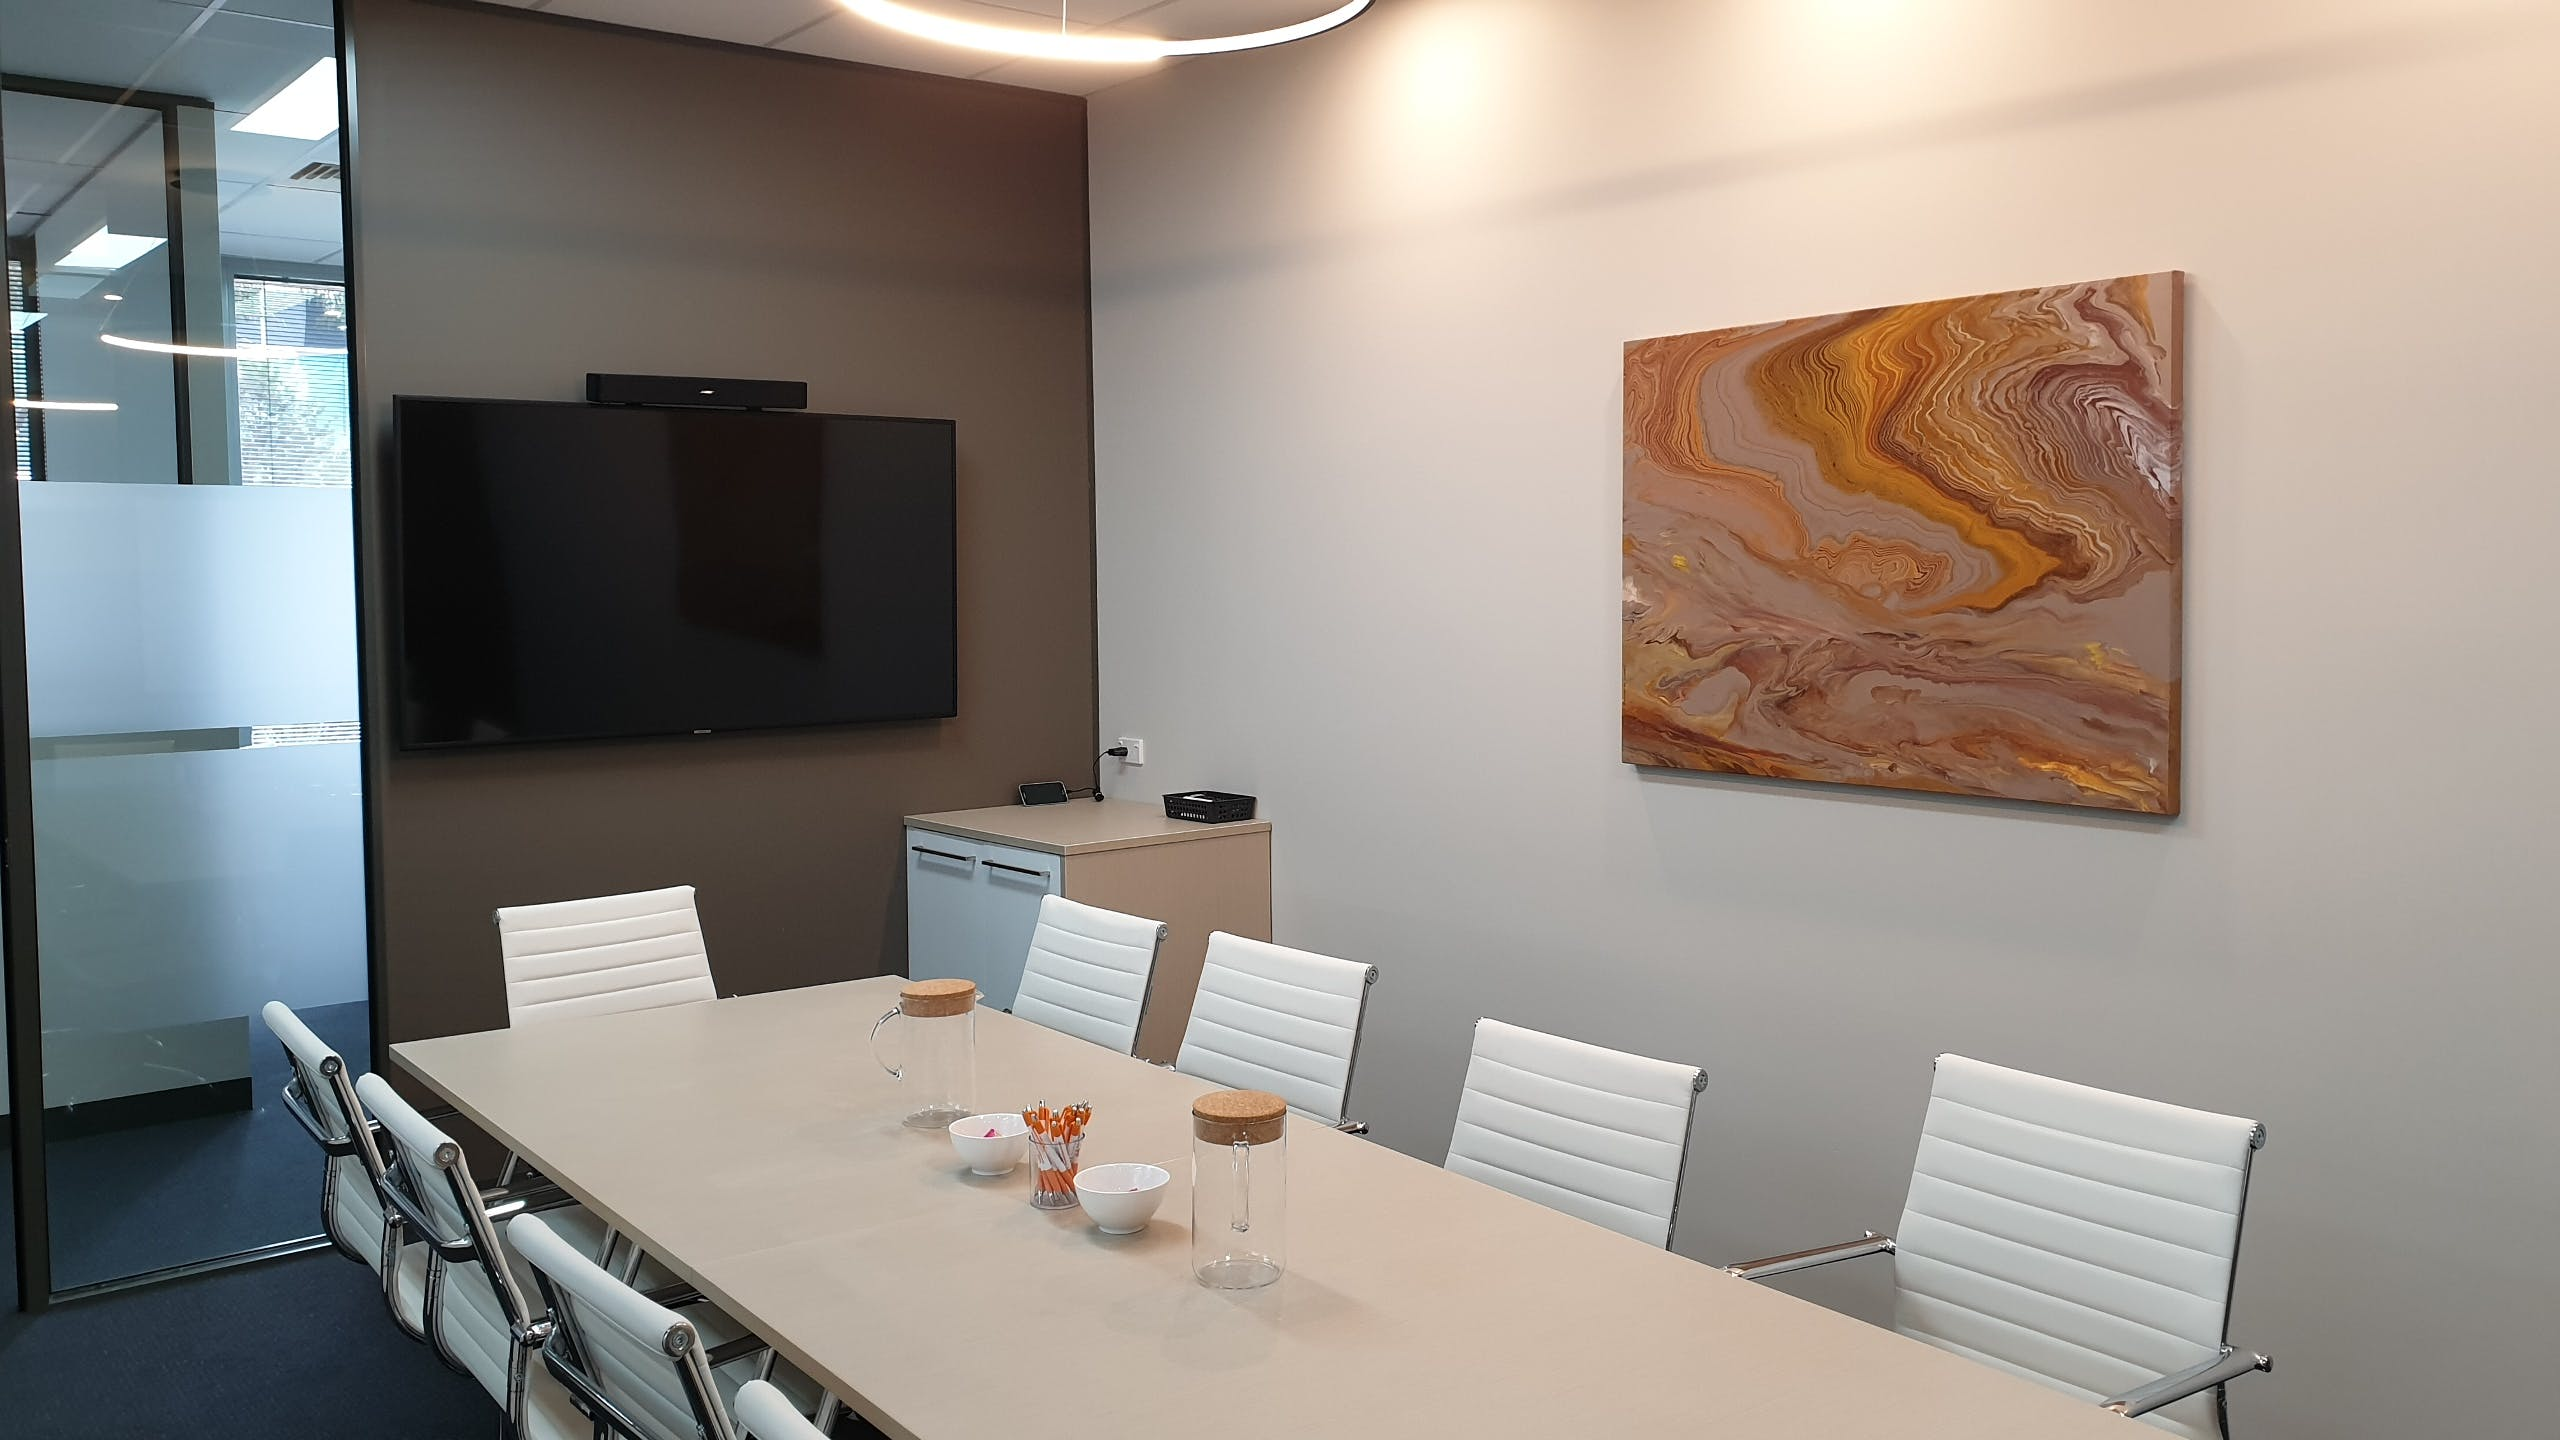 Boardroom, meeting room at 296 Bay Road, image 1